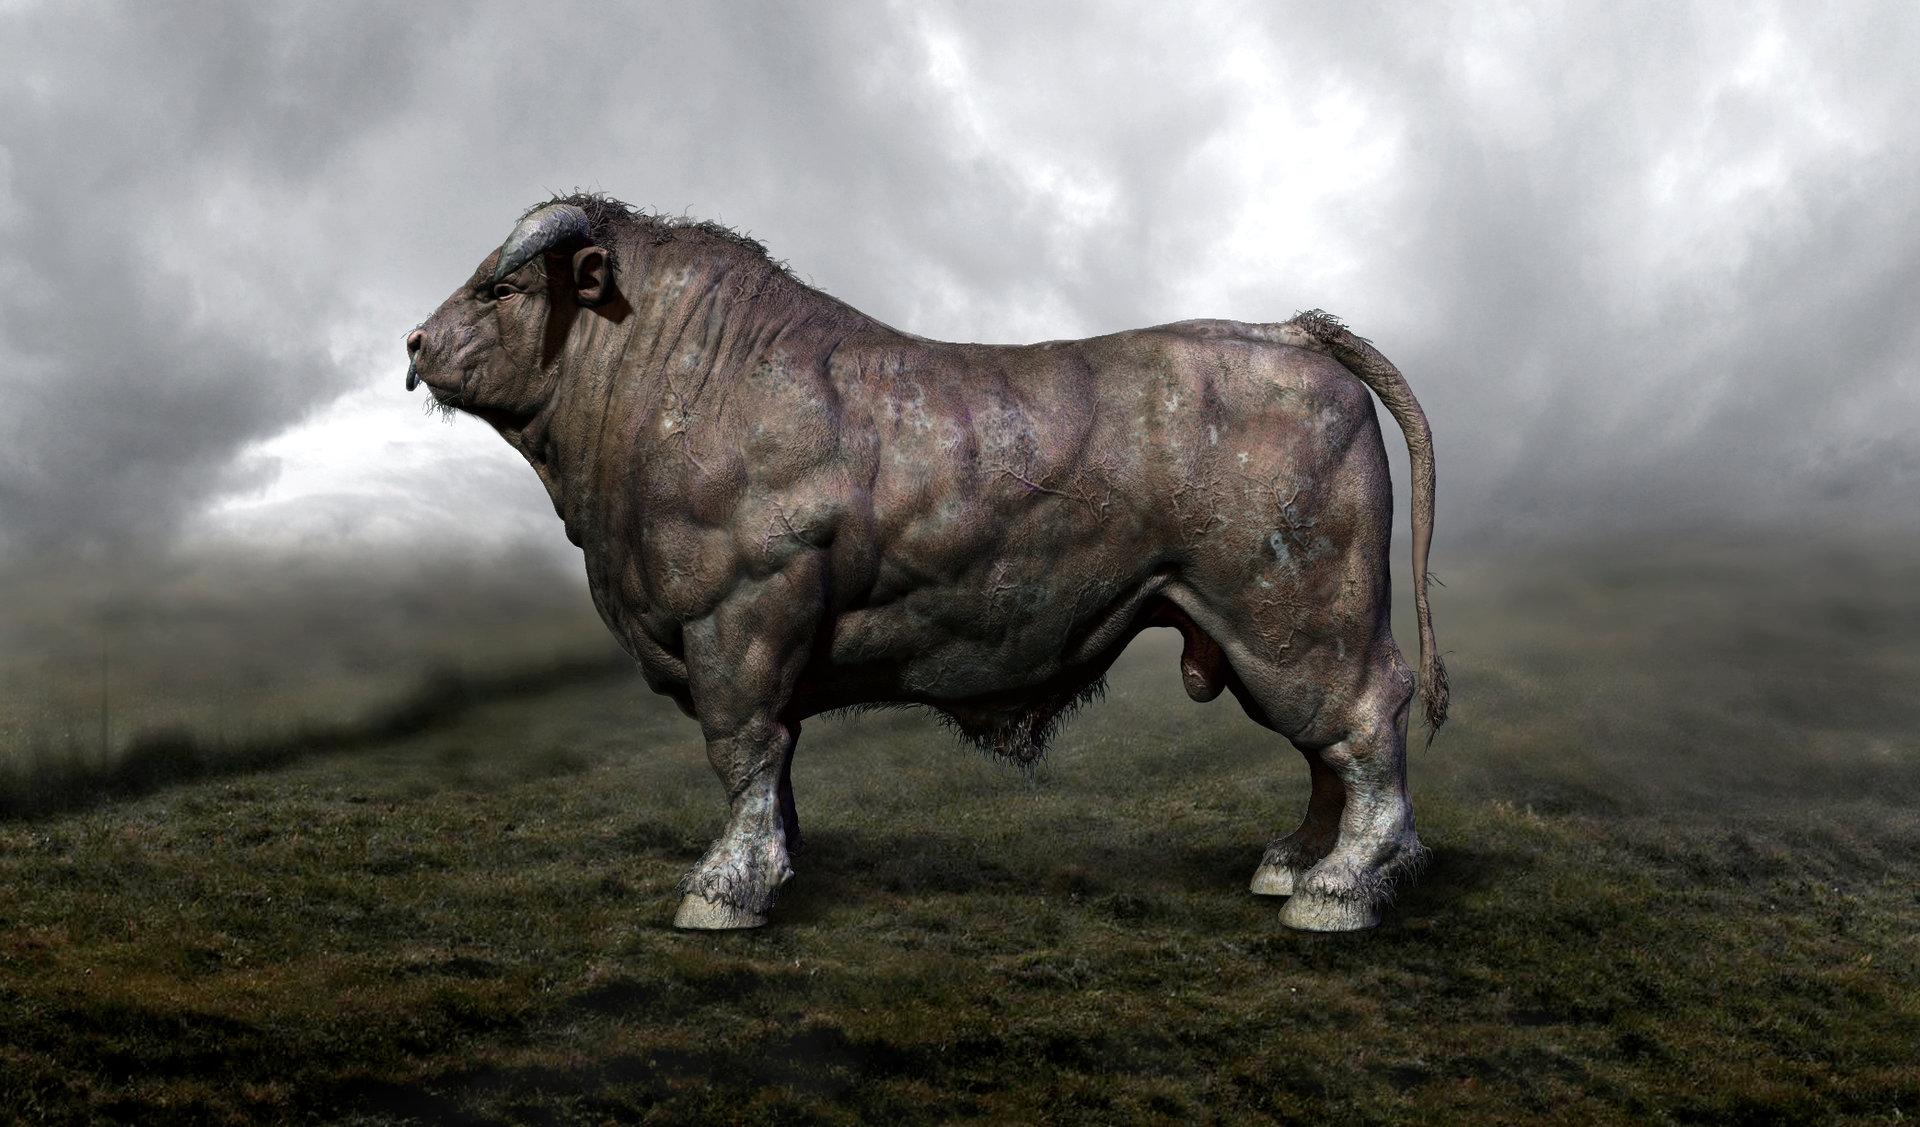 Daniel Midholt - Anatomy study - Bull